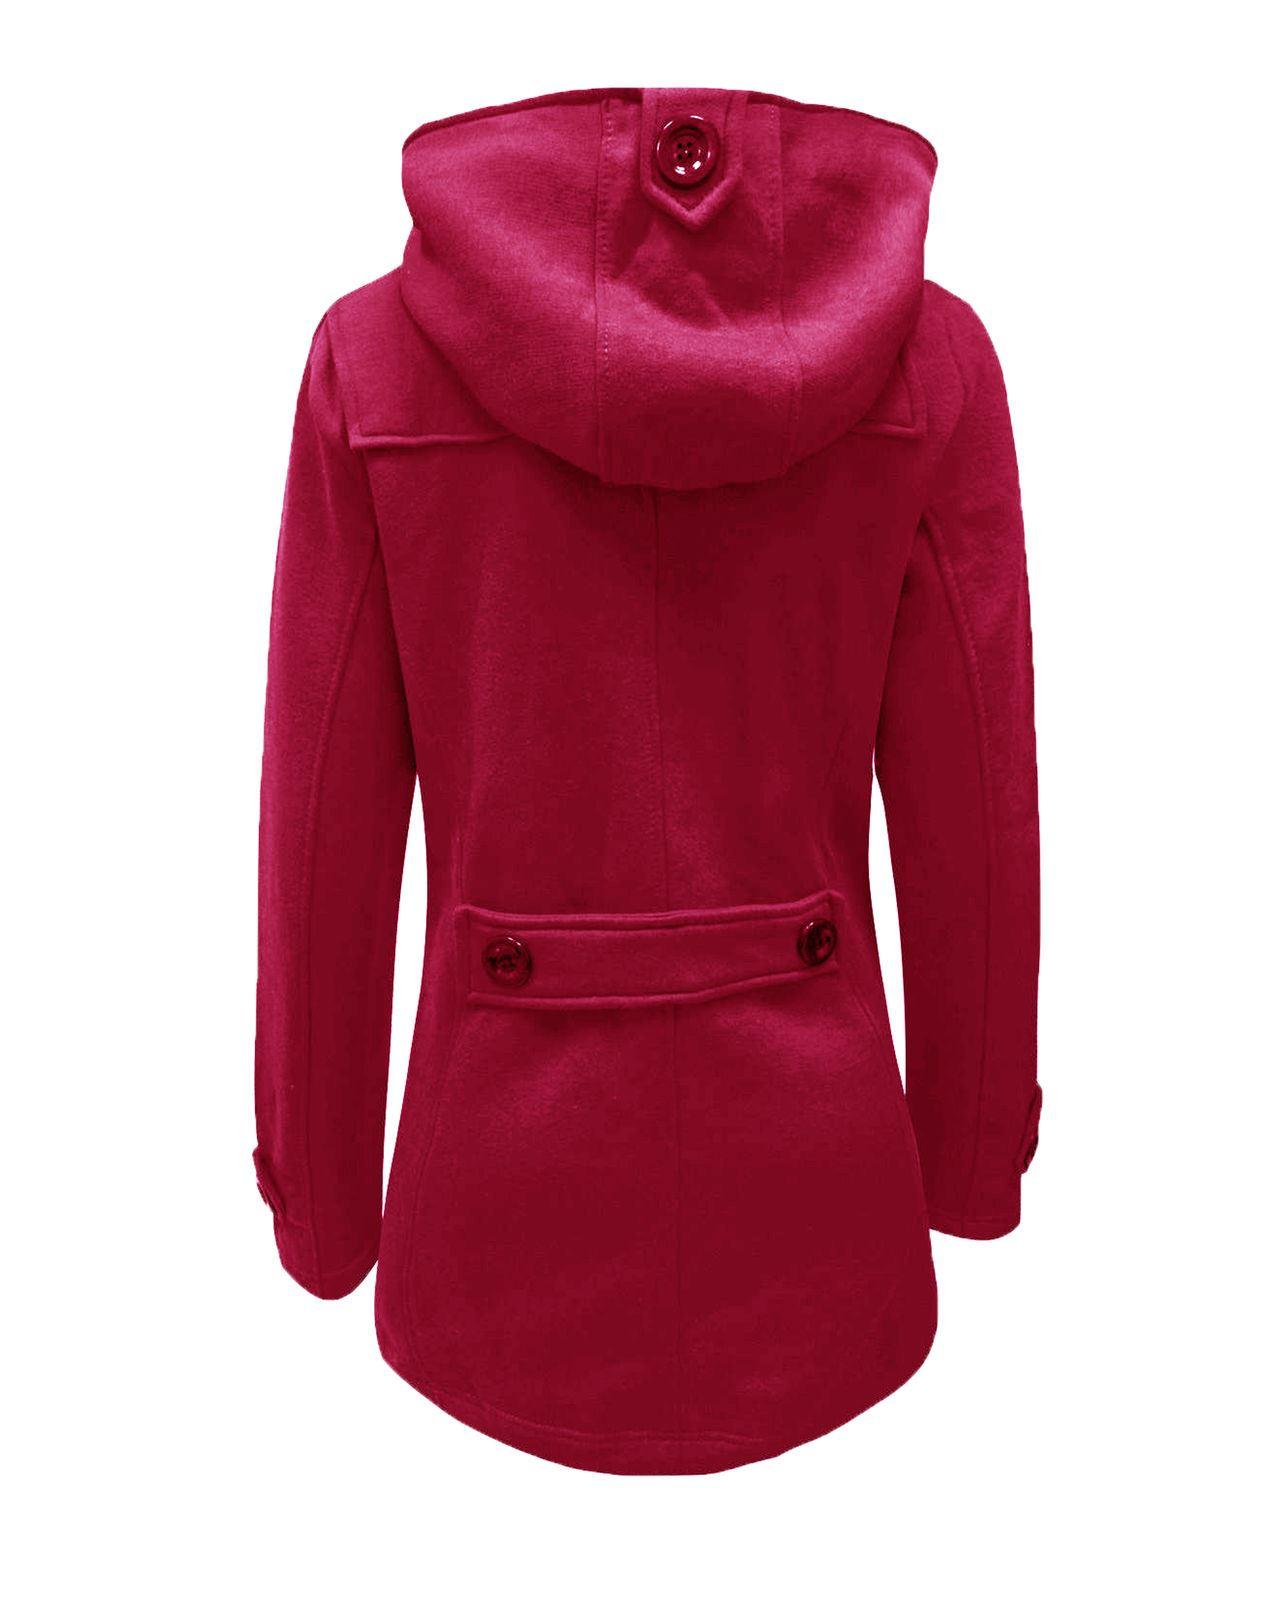 Ladies Womens Fleece Jacket Duffle Toggle Style Hooded Pocket Coat Top Size 8-20